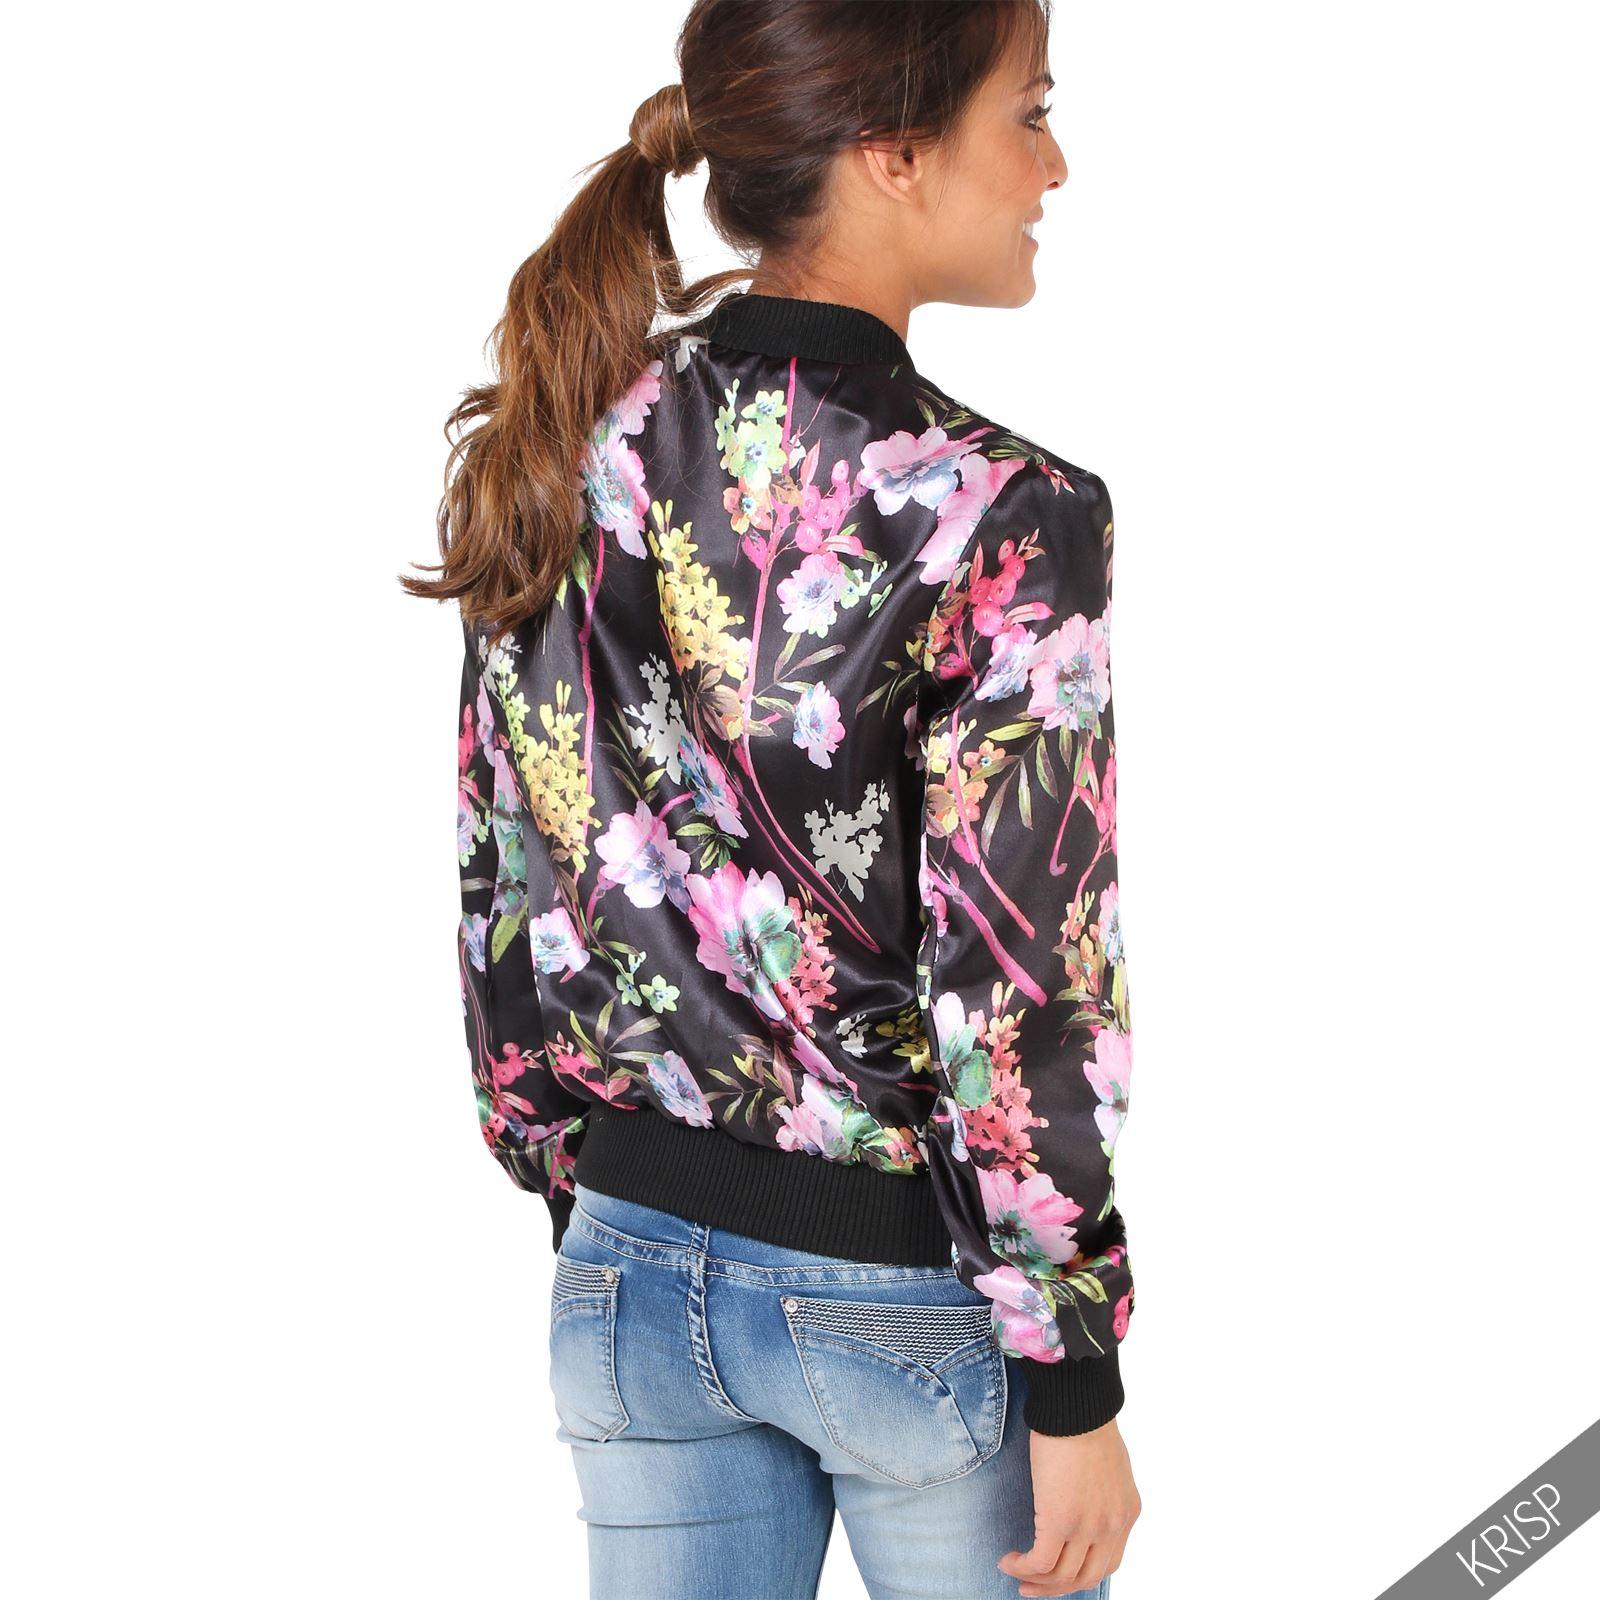 femme veste blouson fleuri zipp bomber l ger r versible nouveau ebay. Black Bedroom Furniture Sets. Home Design Ideas